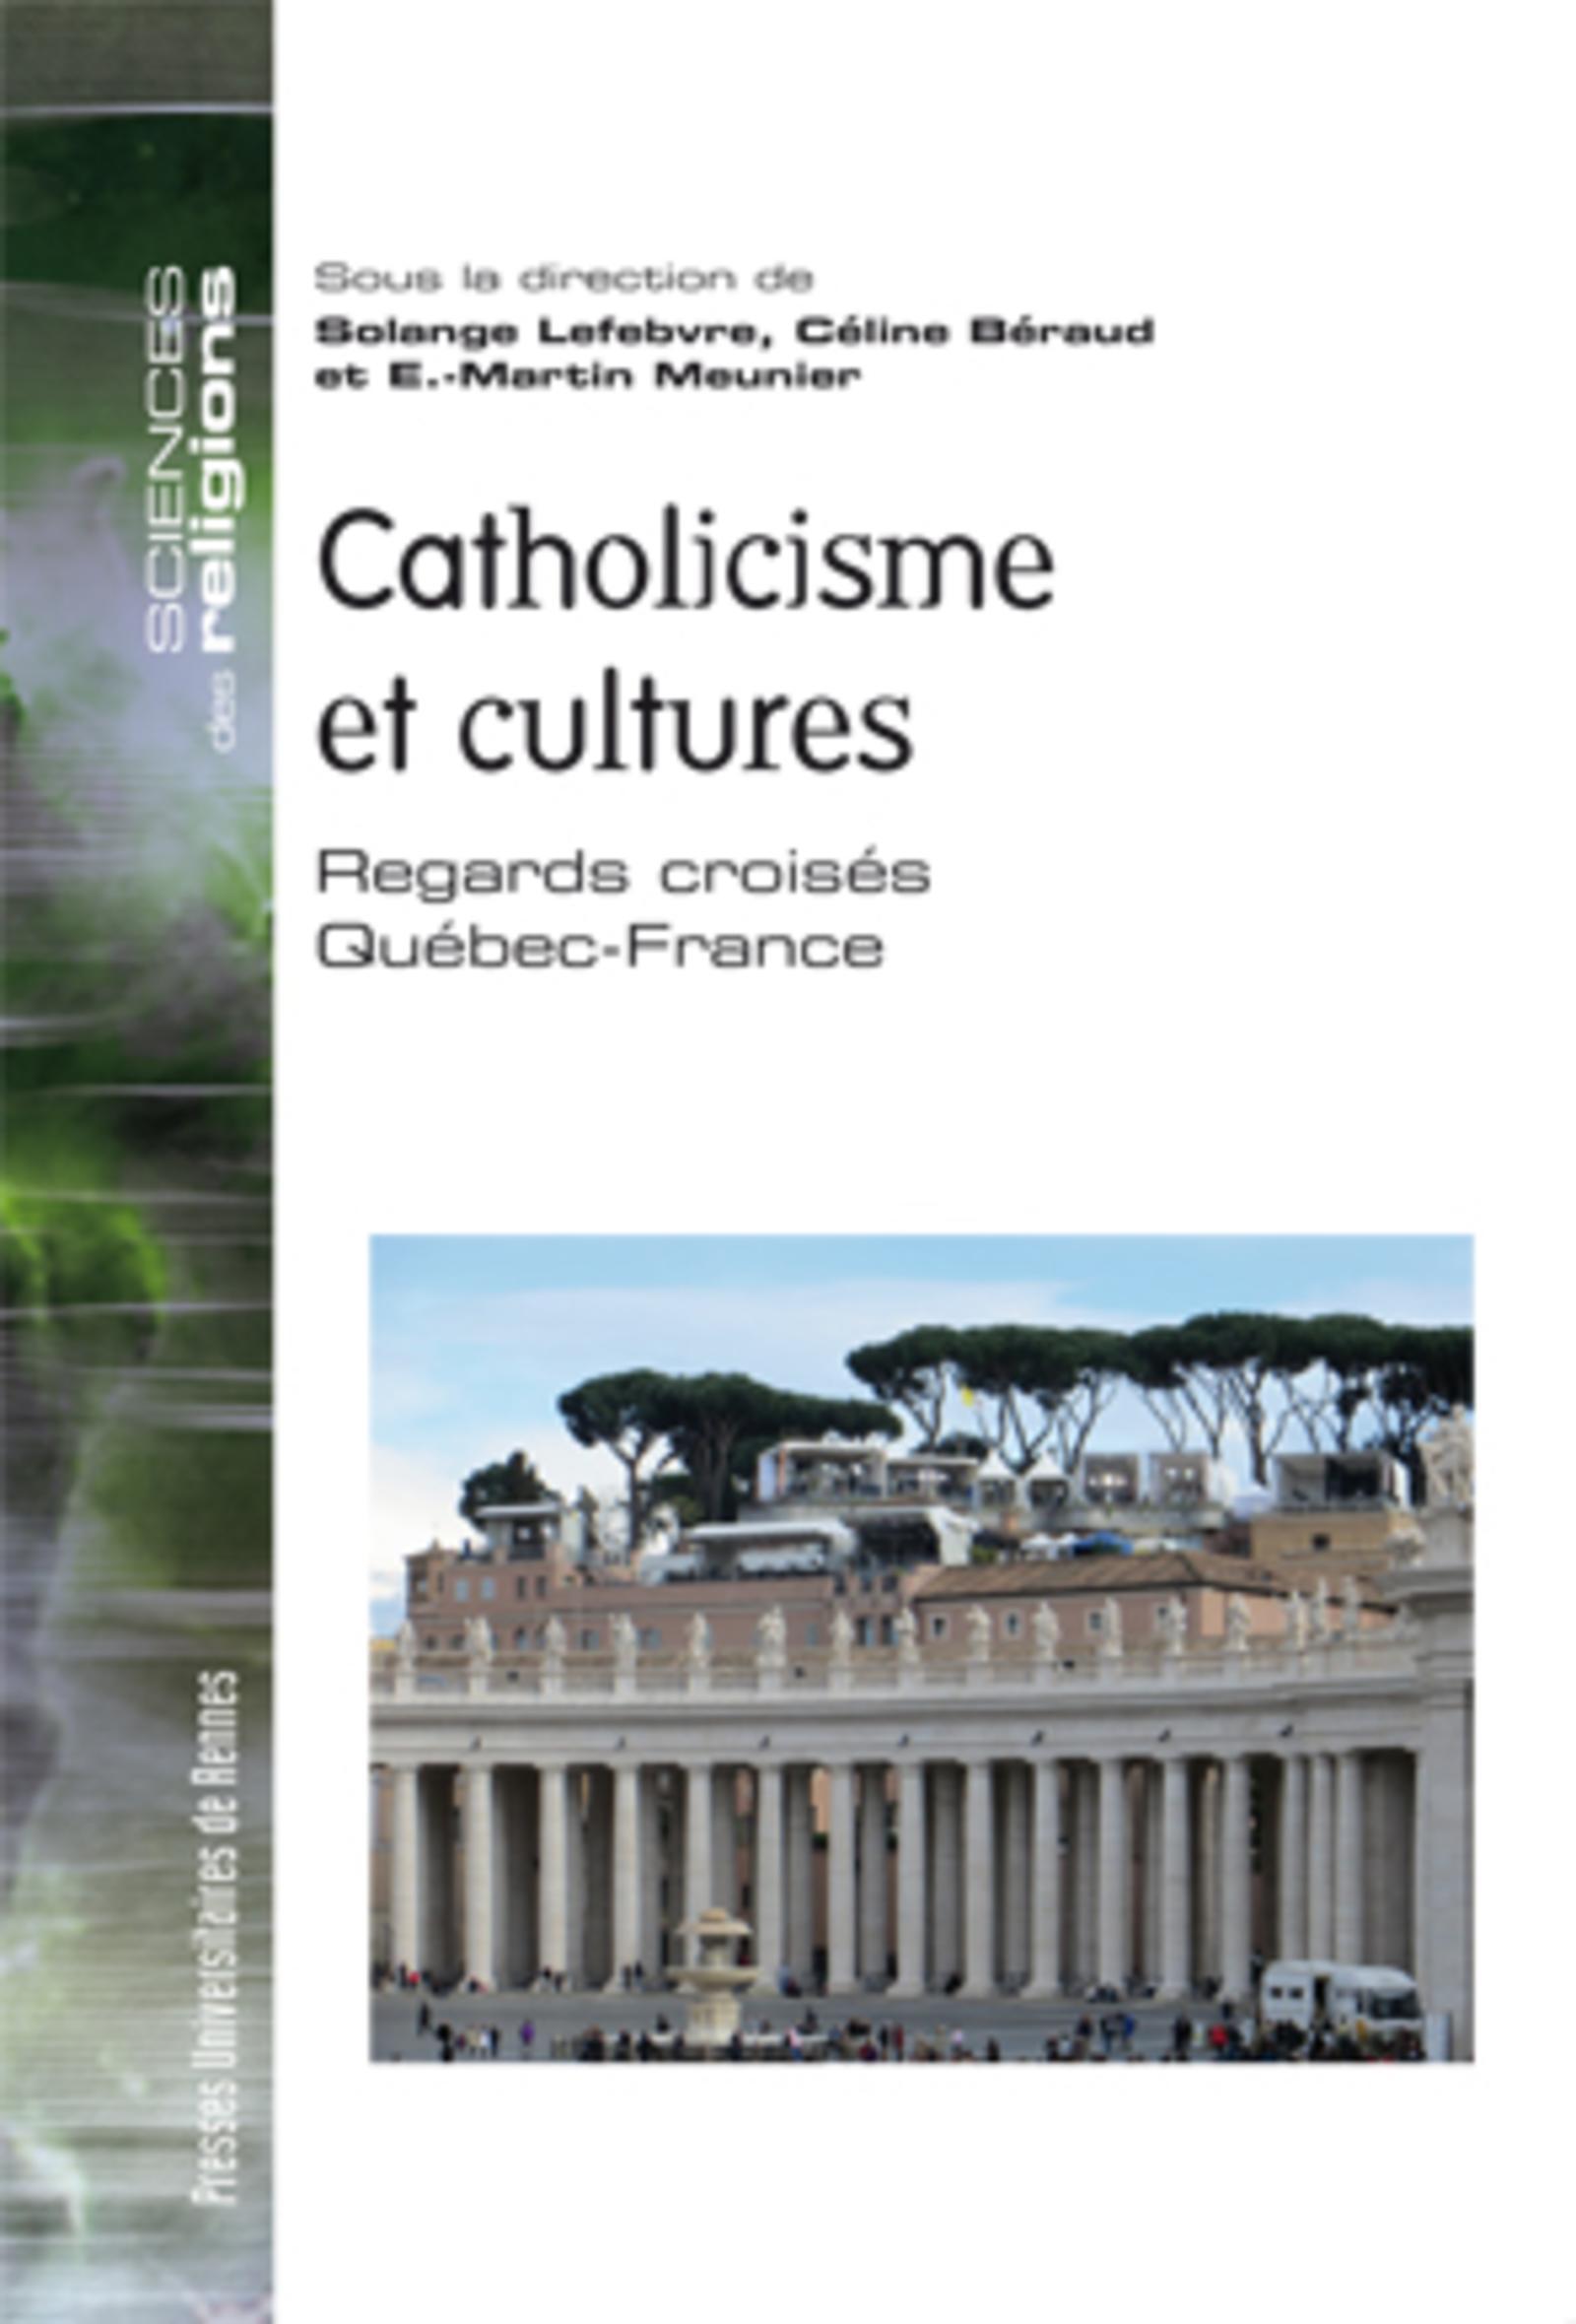 CATHOLICISME ET CULTURES